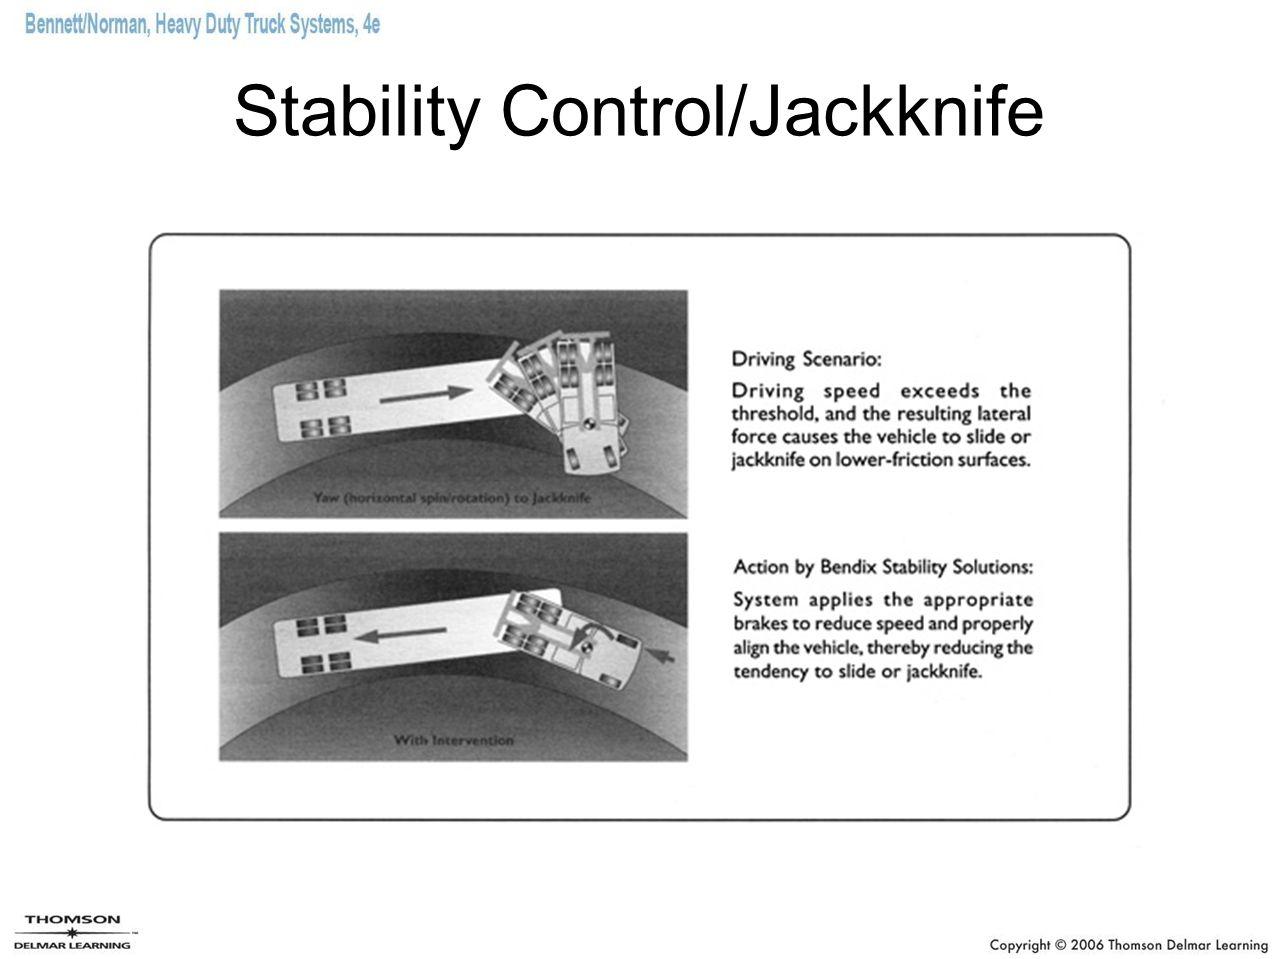 Stability Control/Jackknife